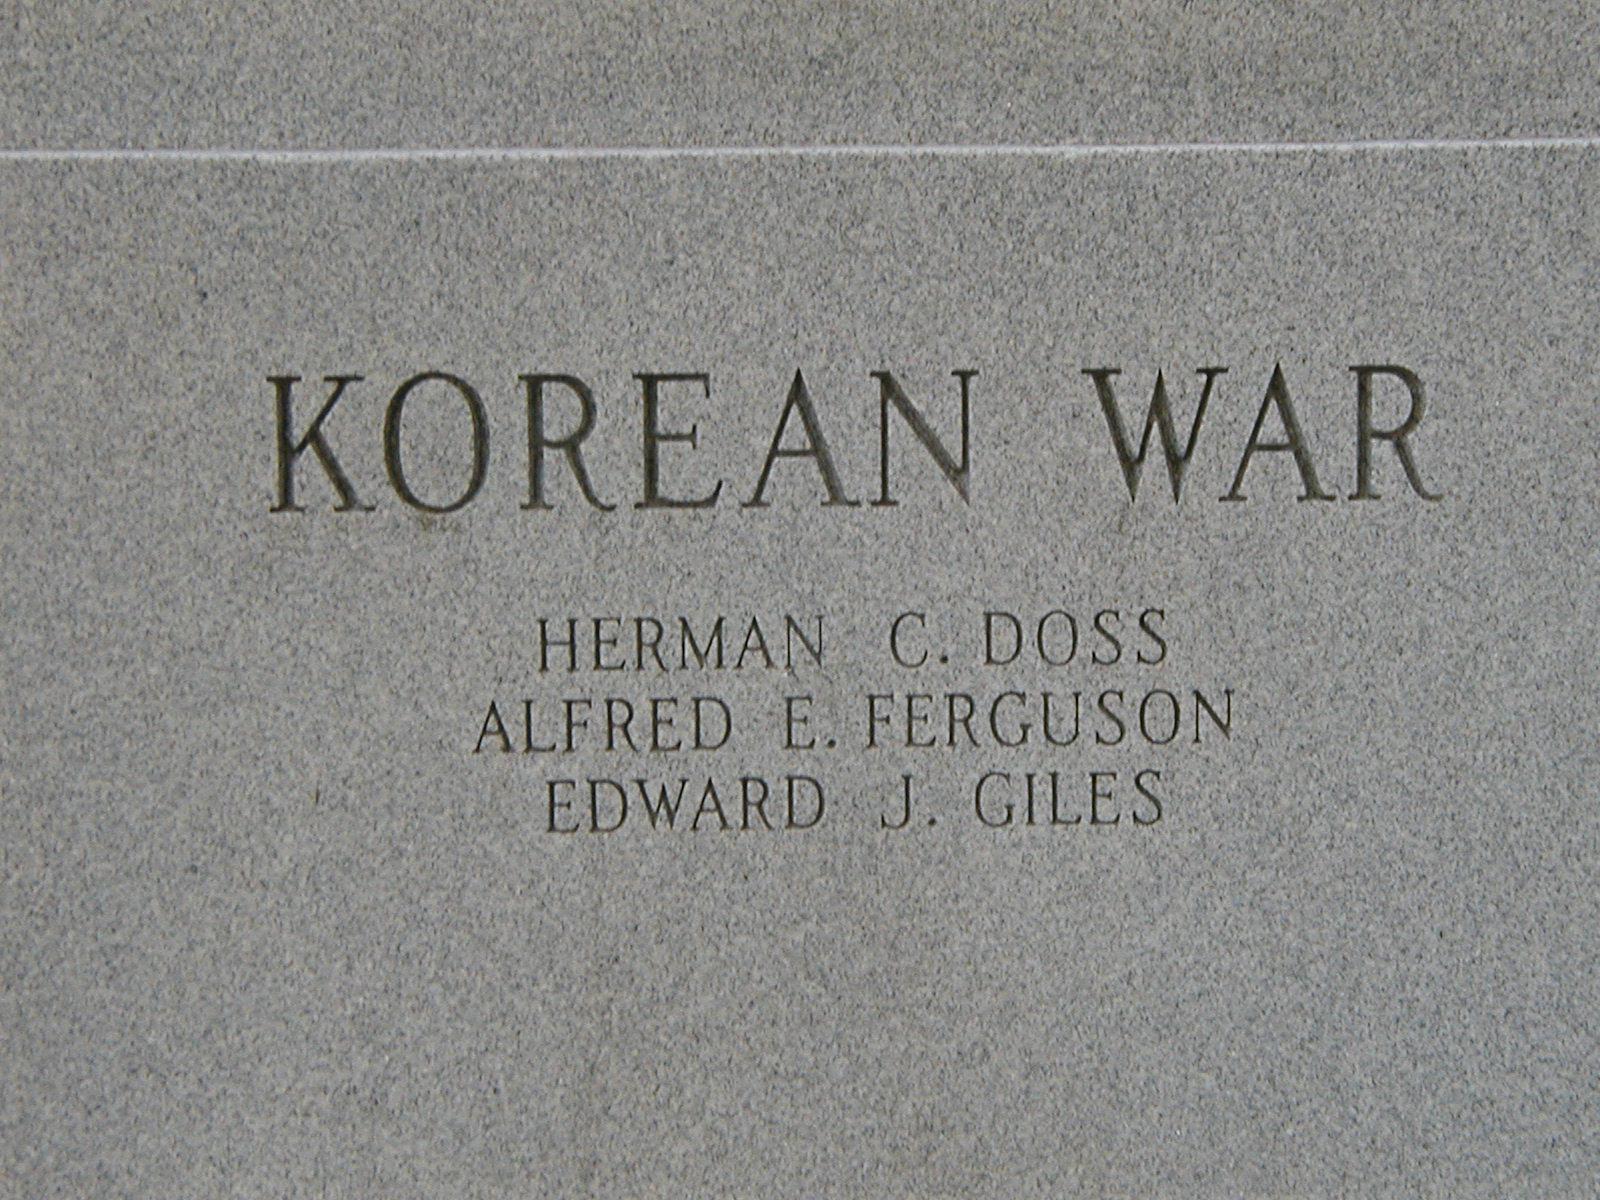 Famous Quotes About Korean War